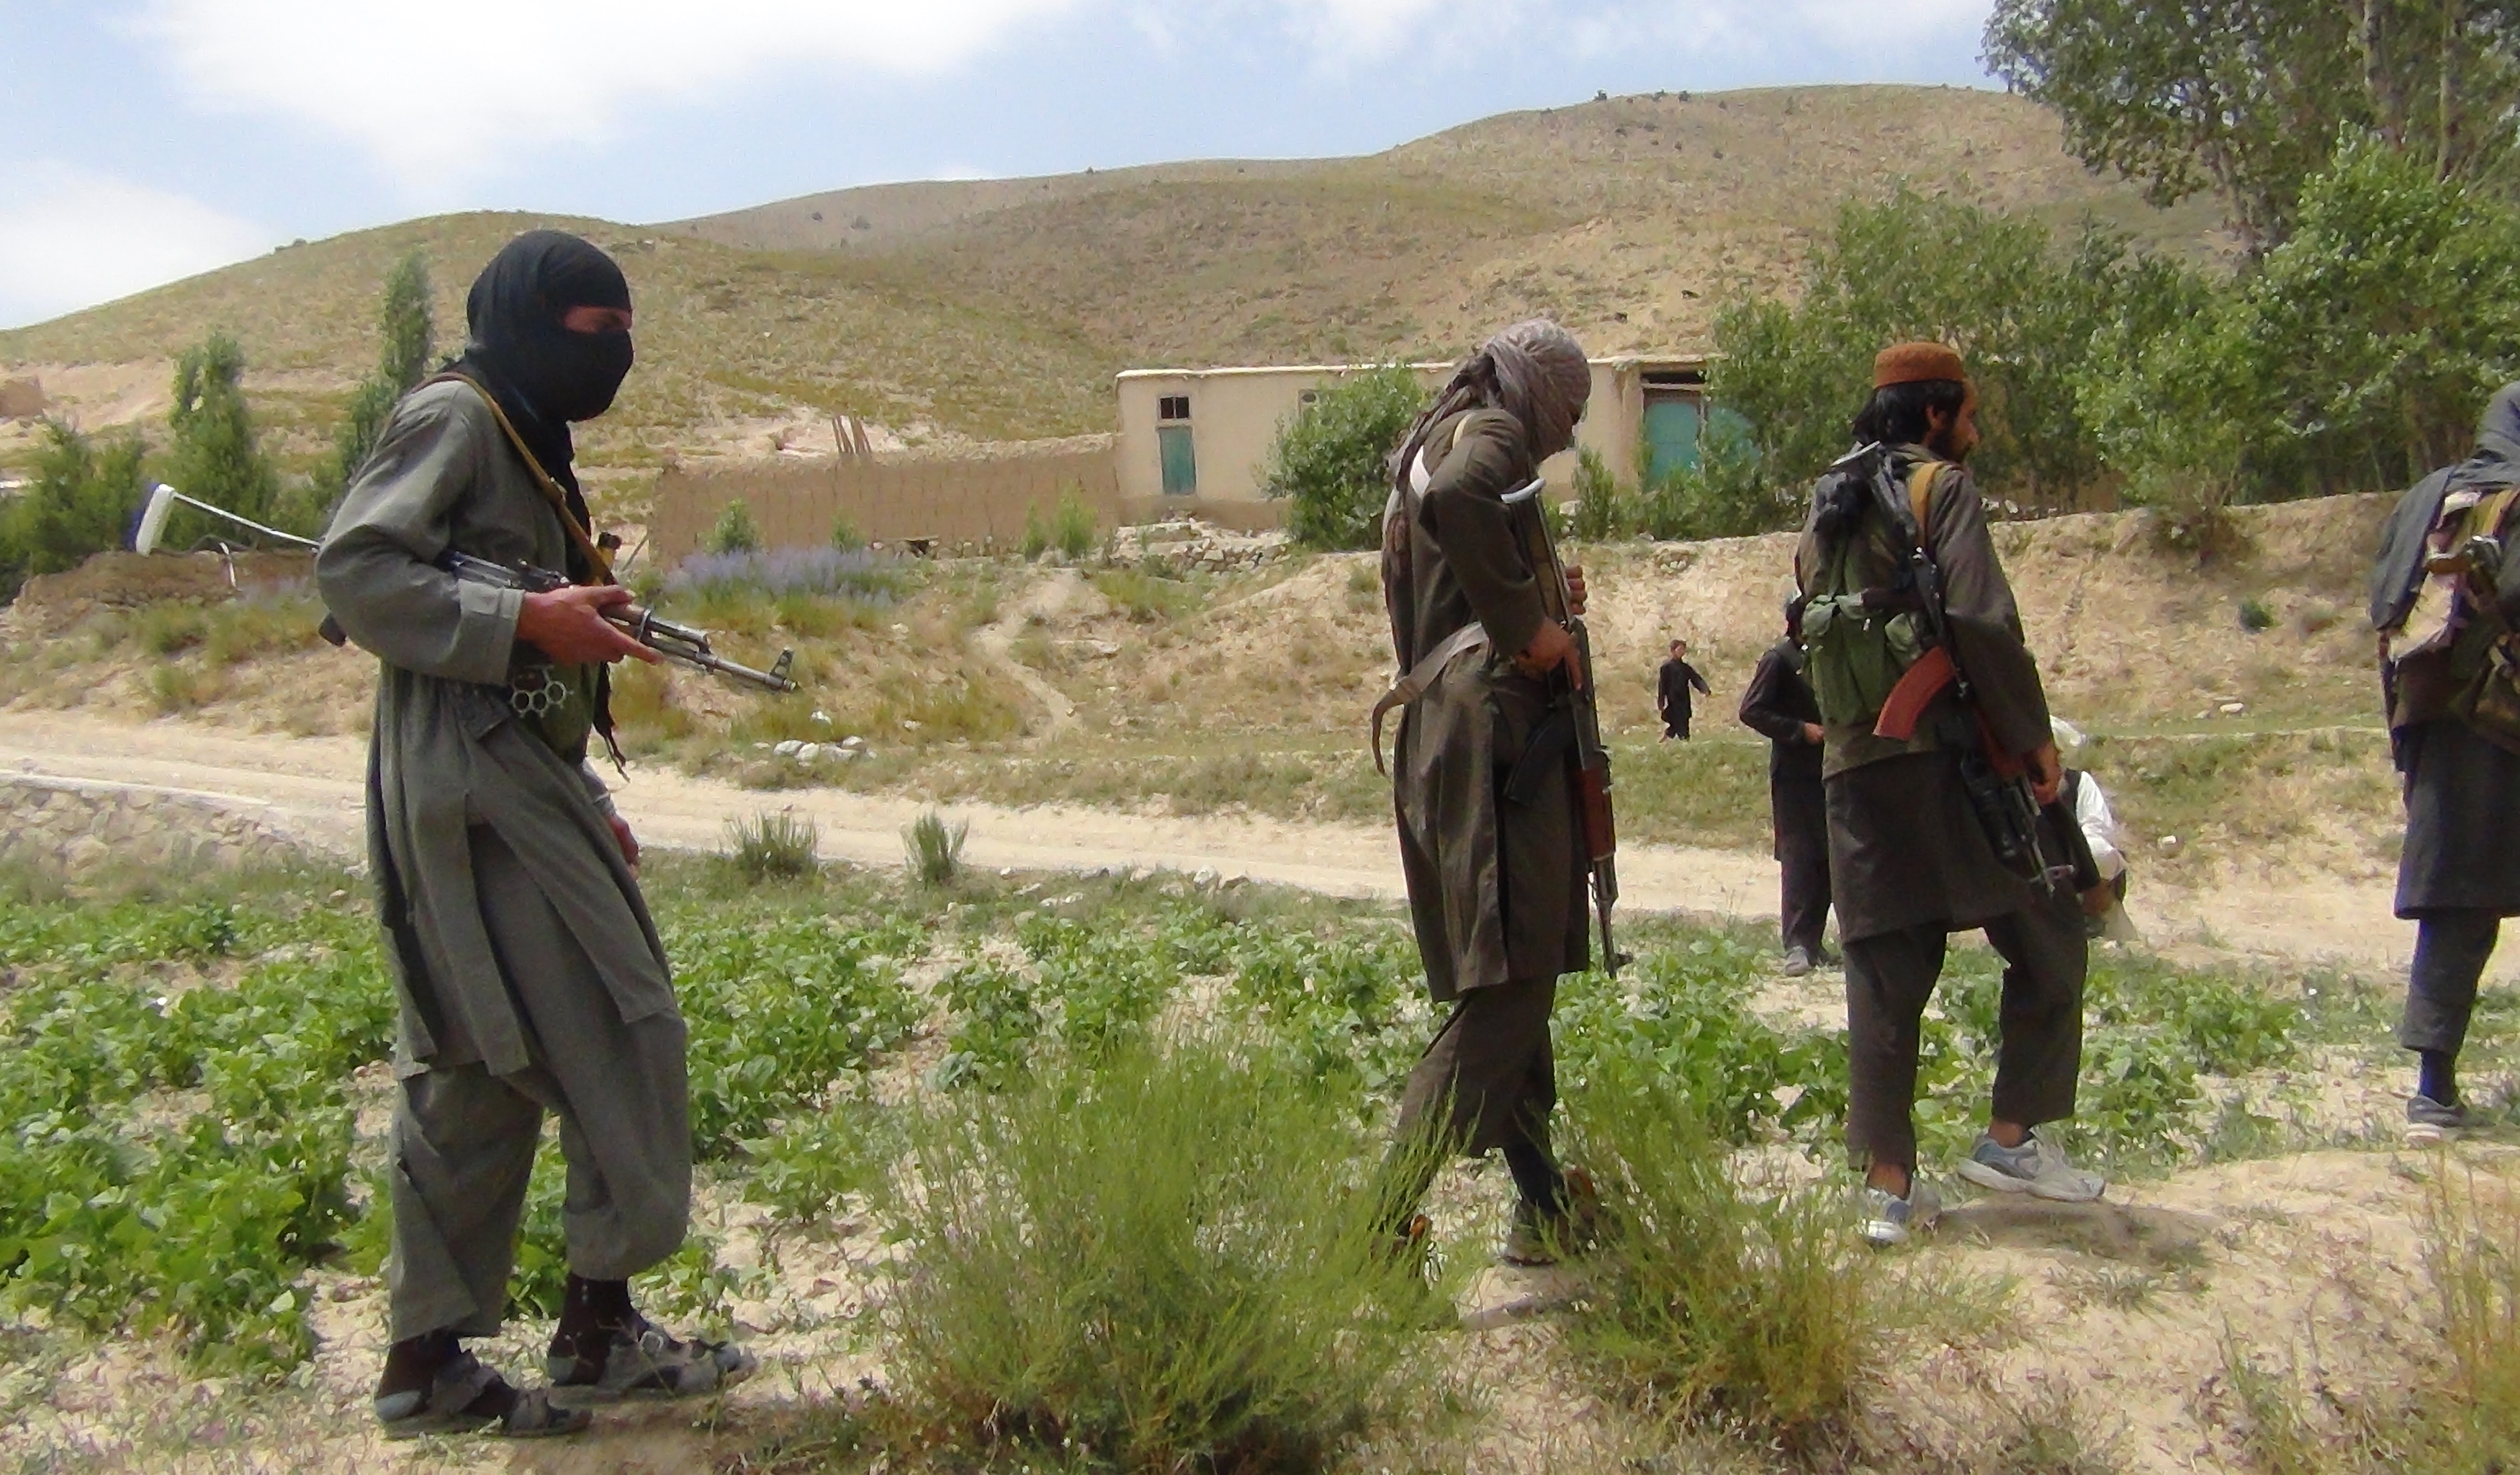 Militants hamper efforts to fight HIV/AIDS among Afghans